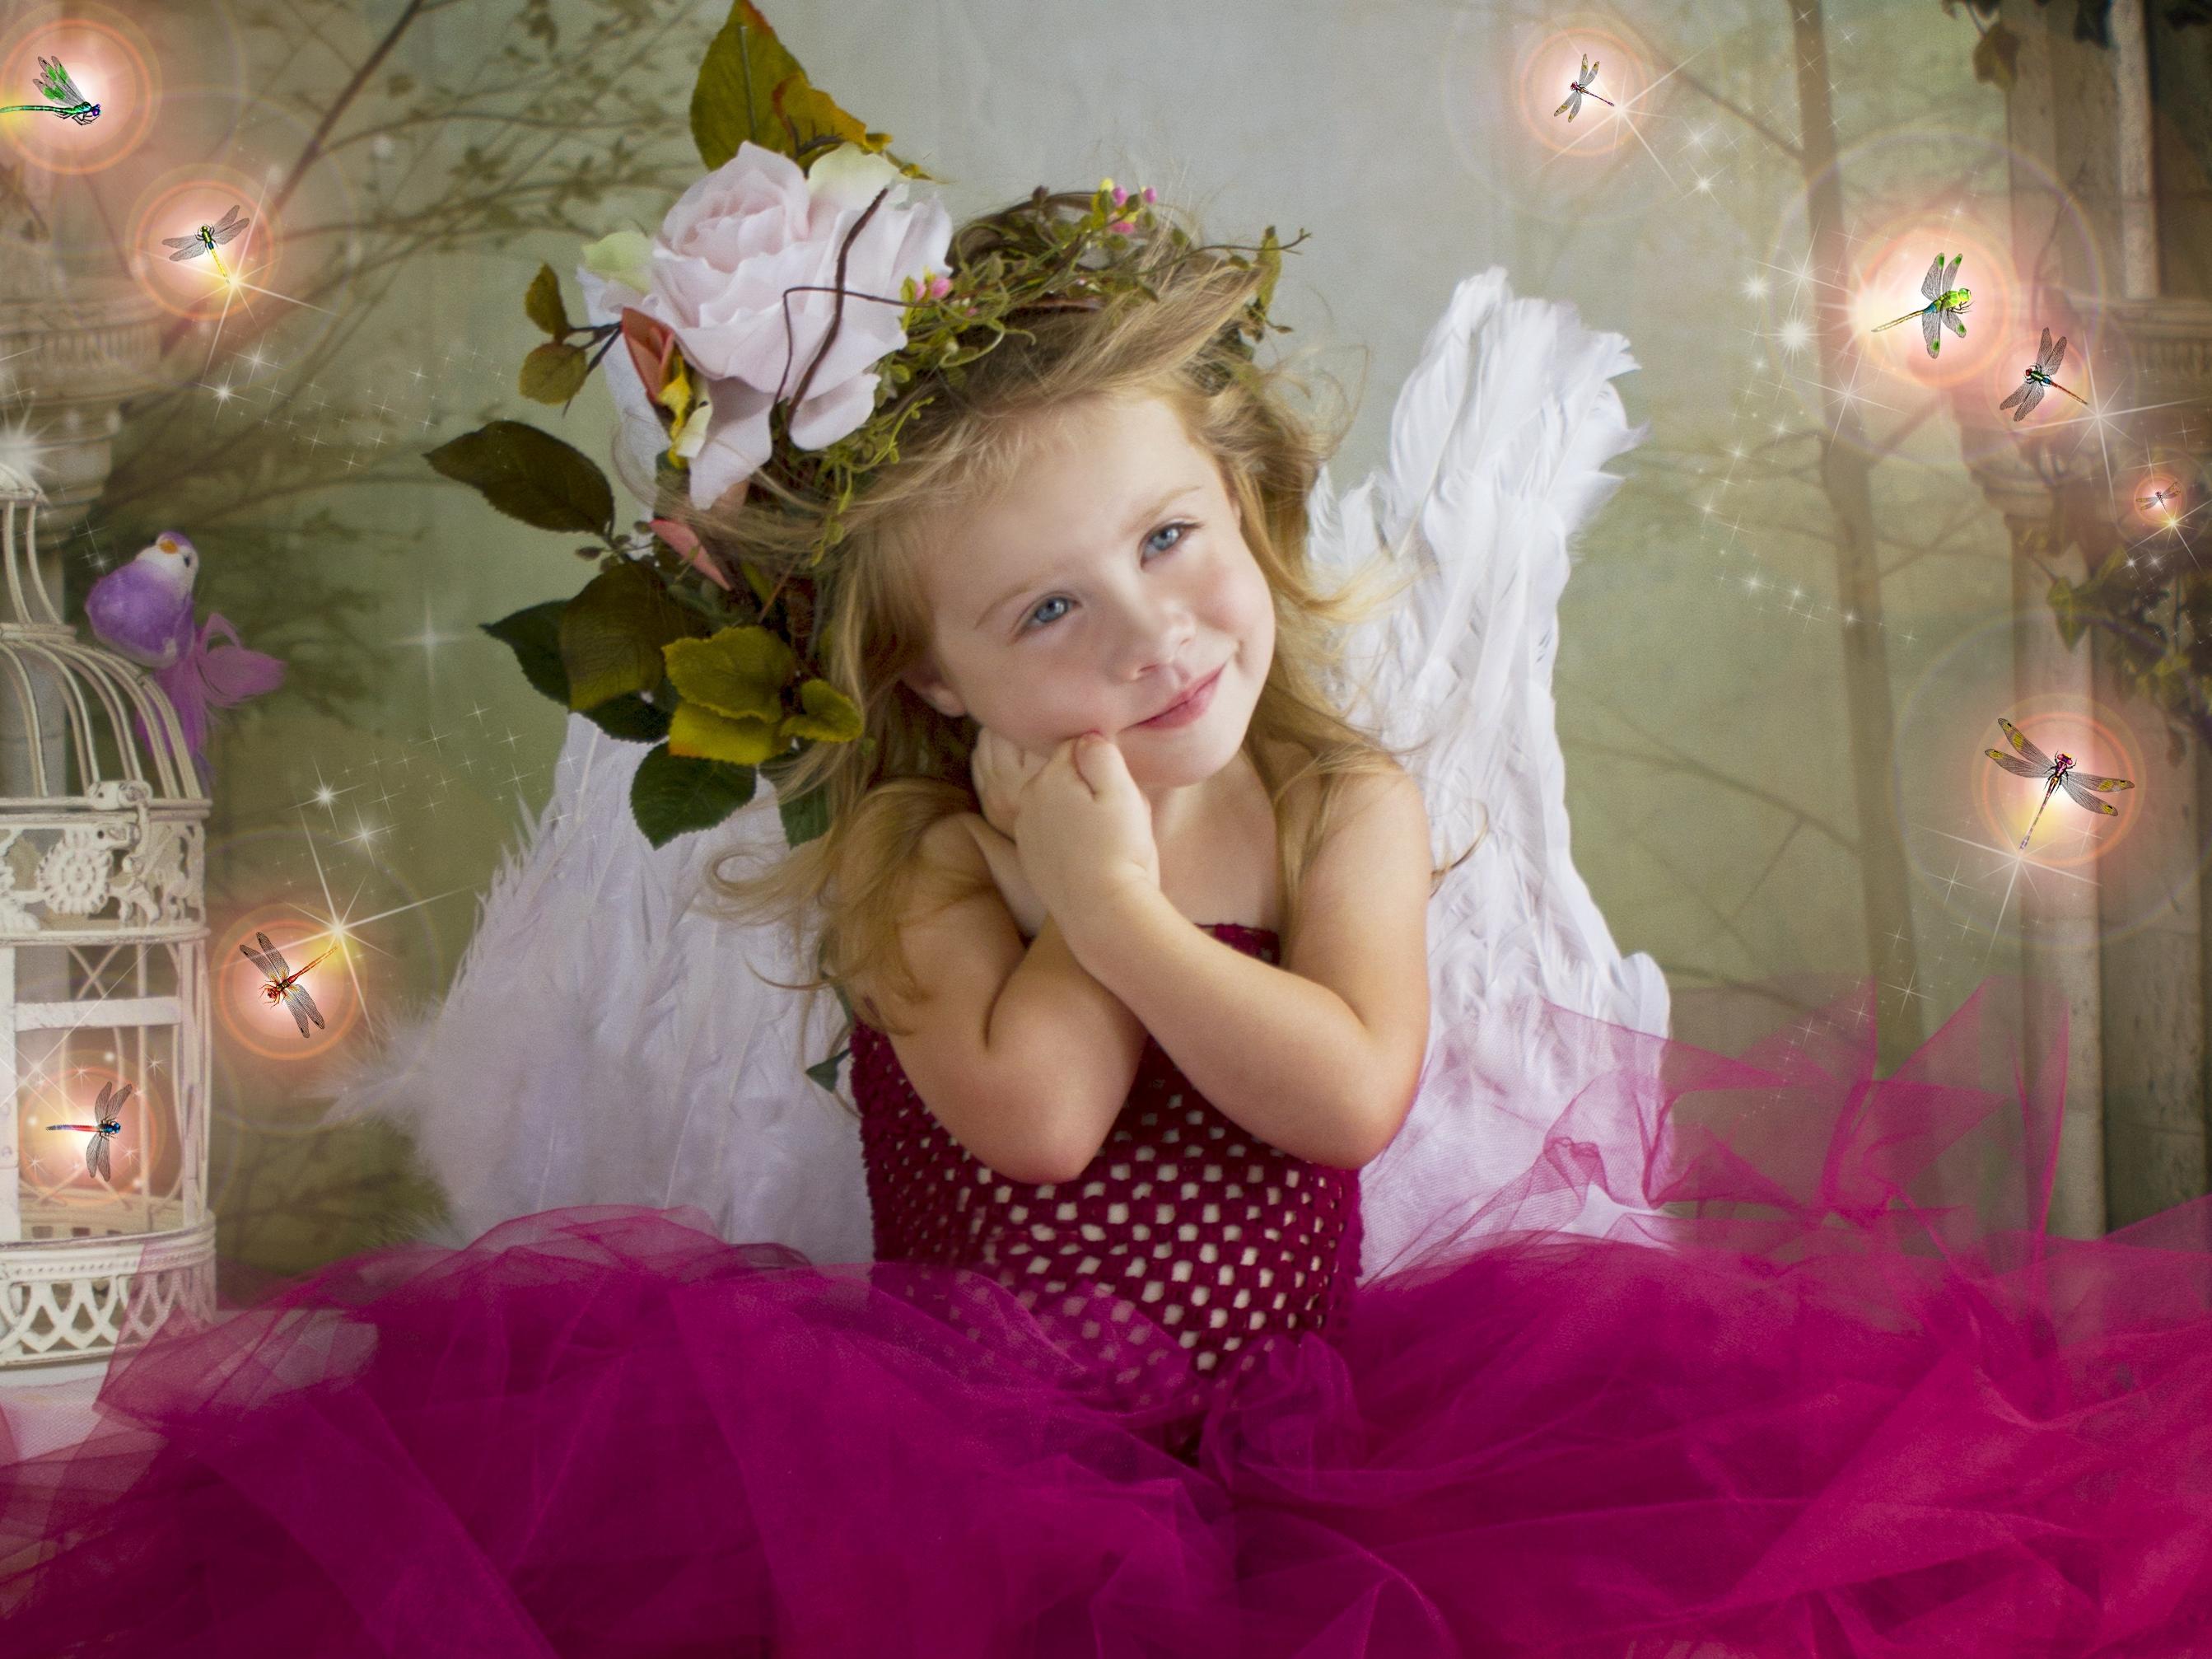 30-Minute Child Photo Shoot